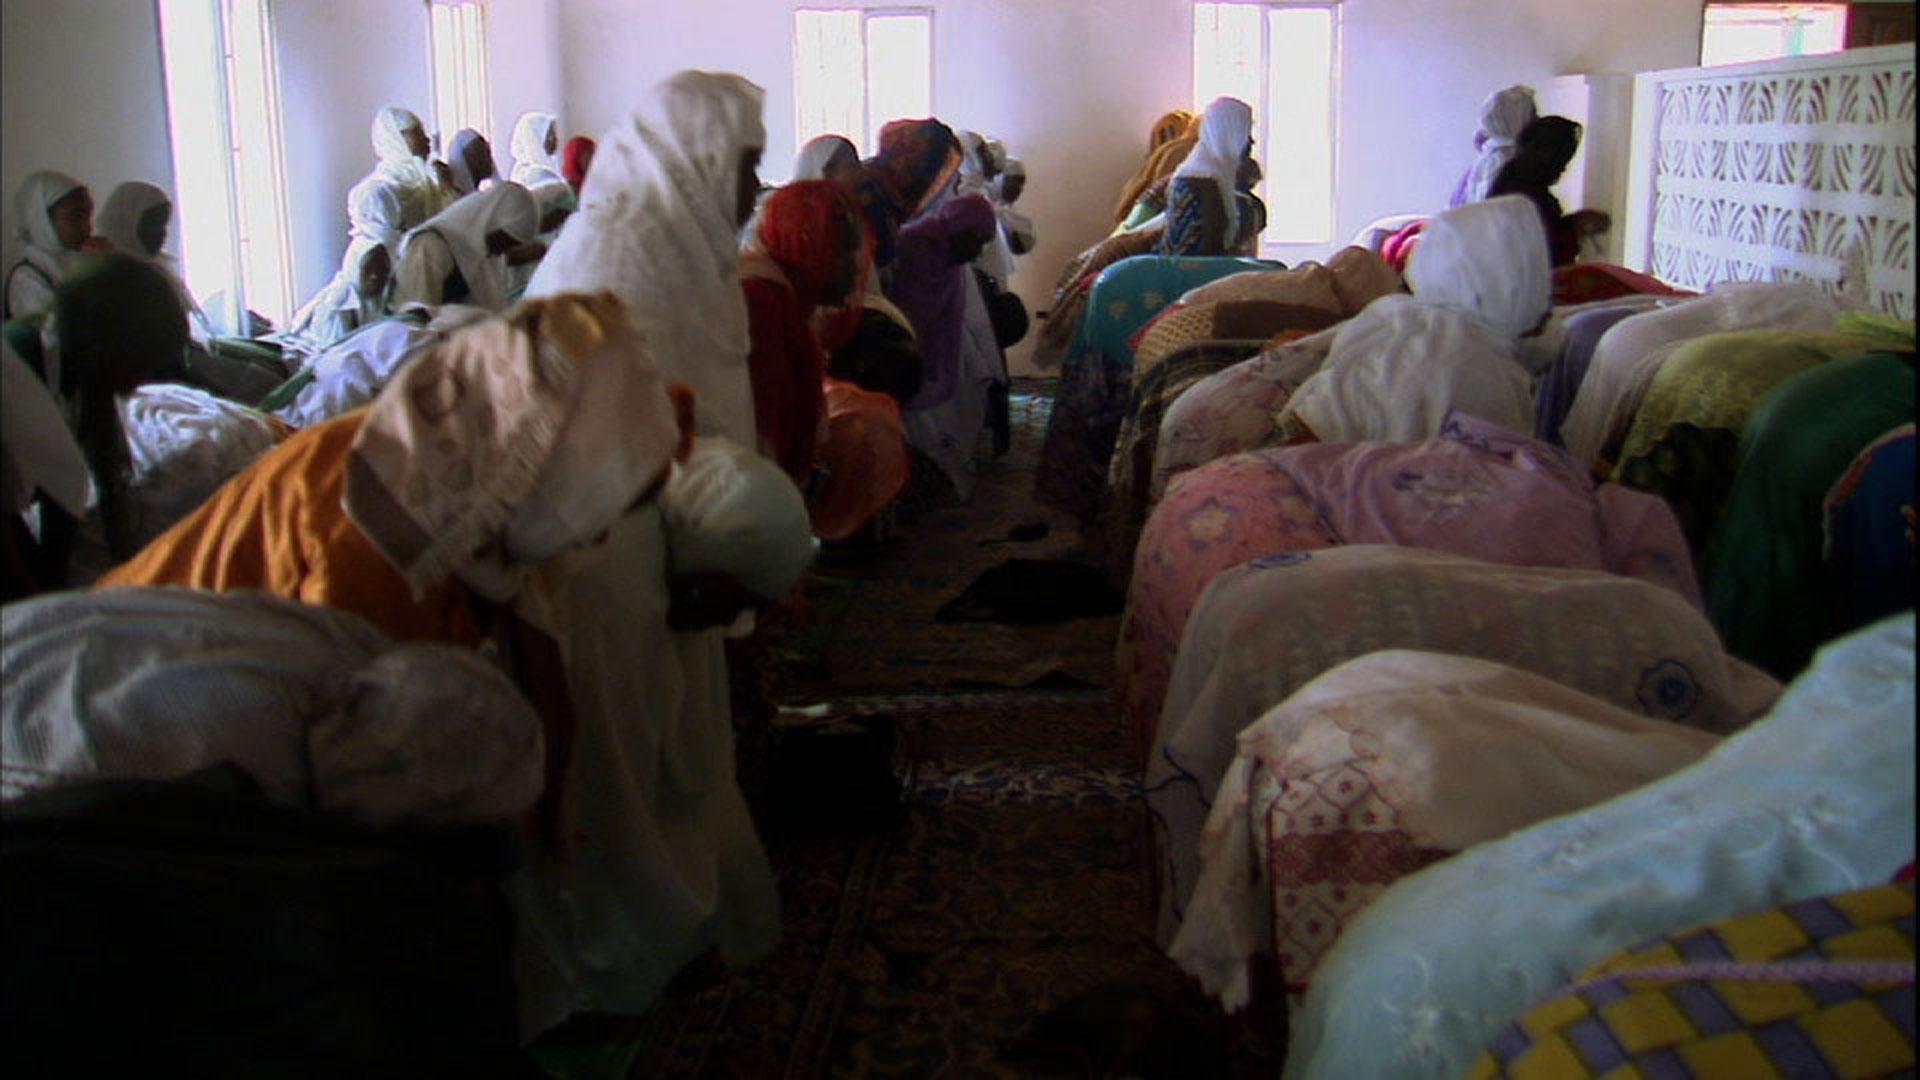 shop Prison of women: